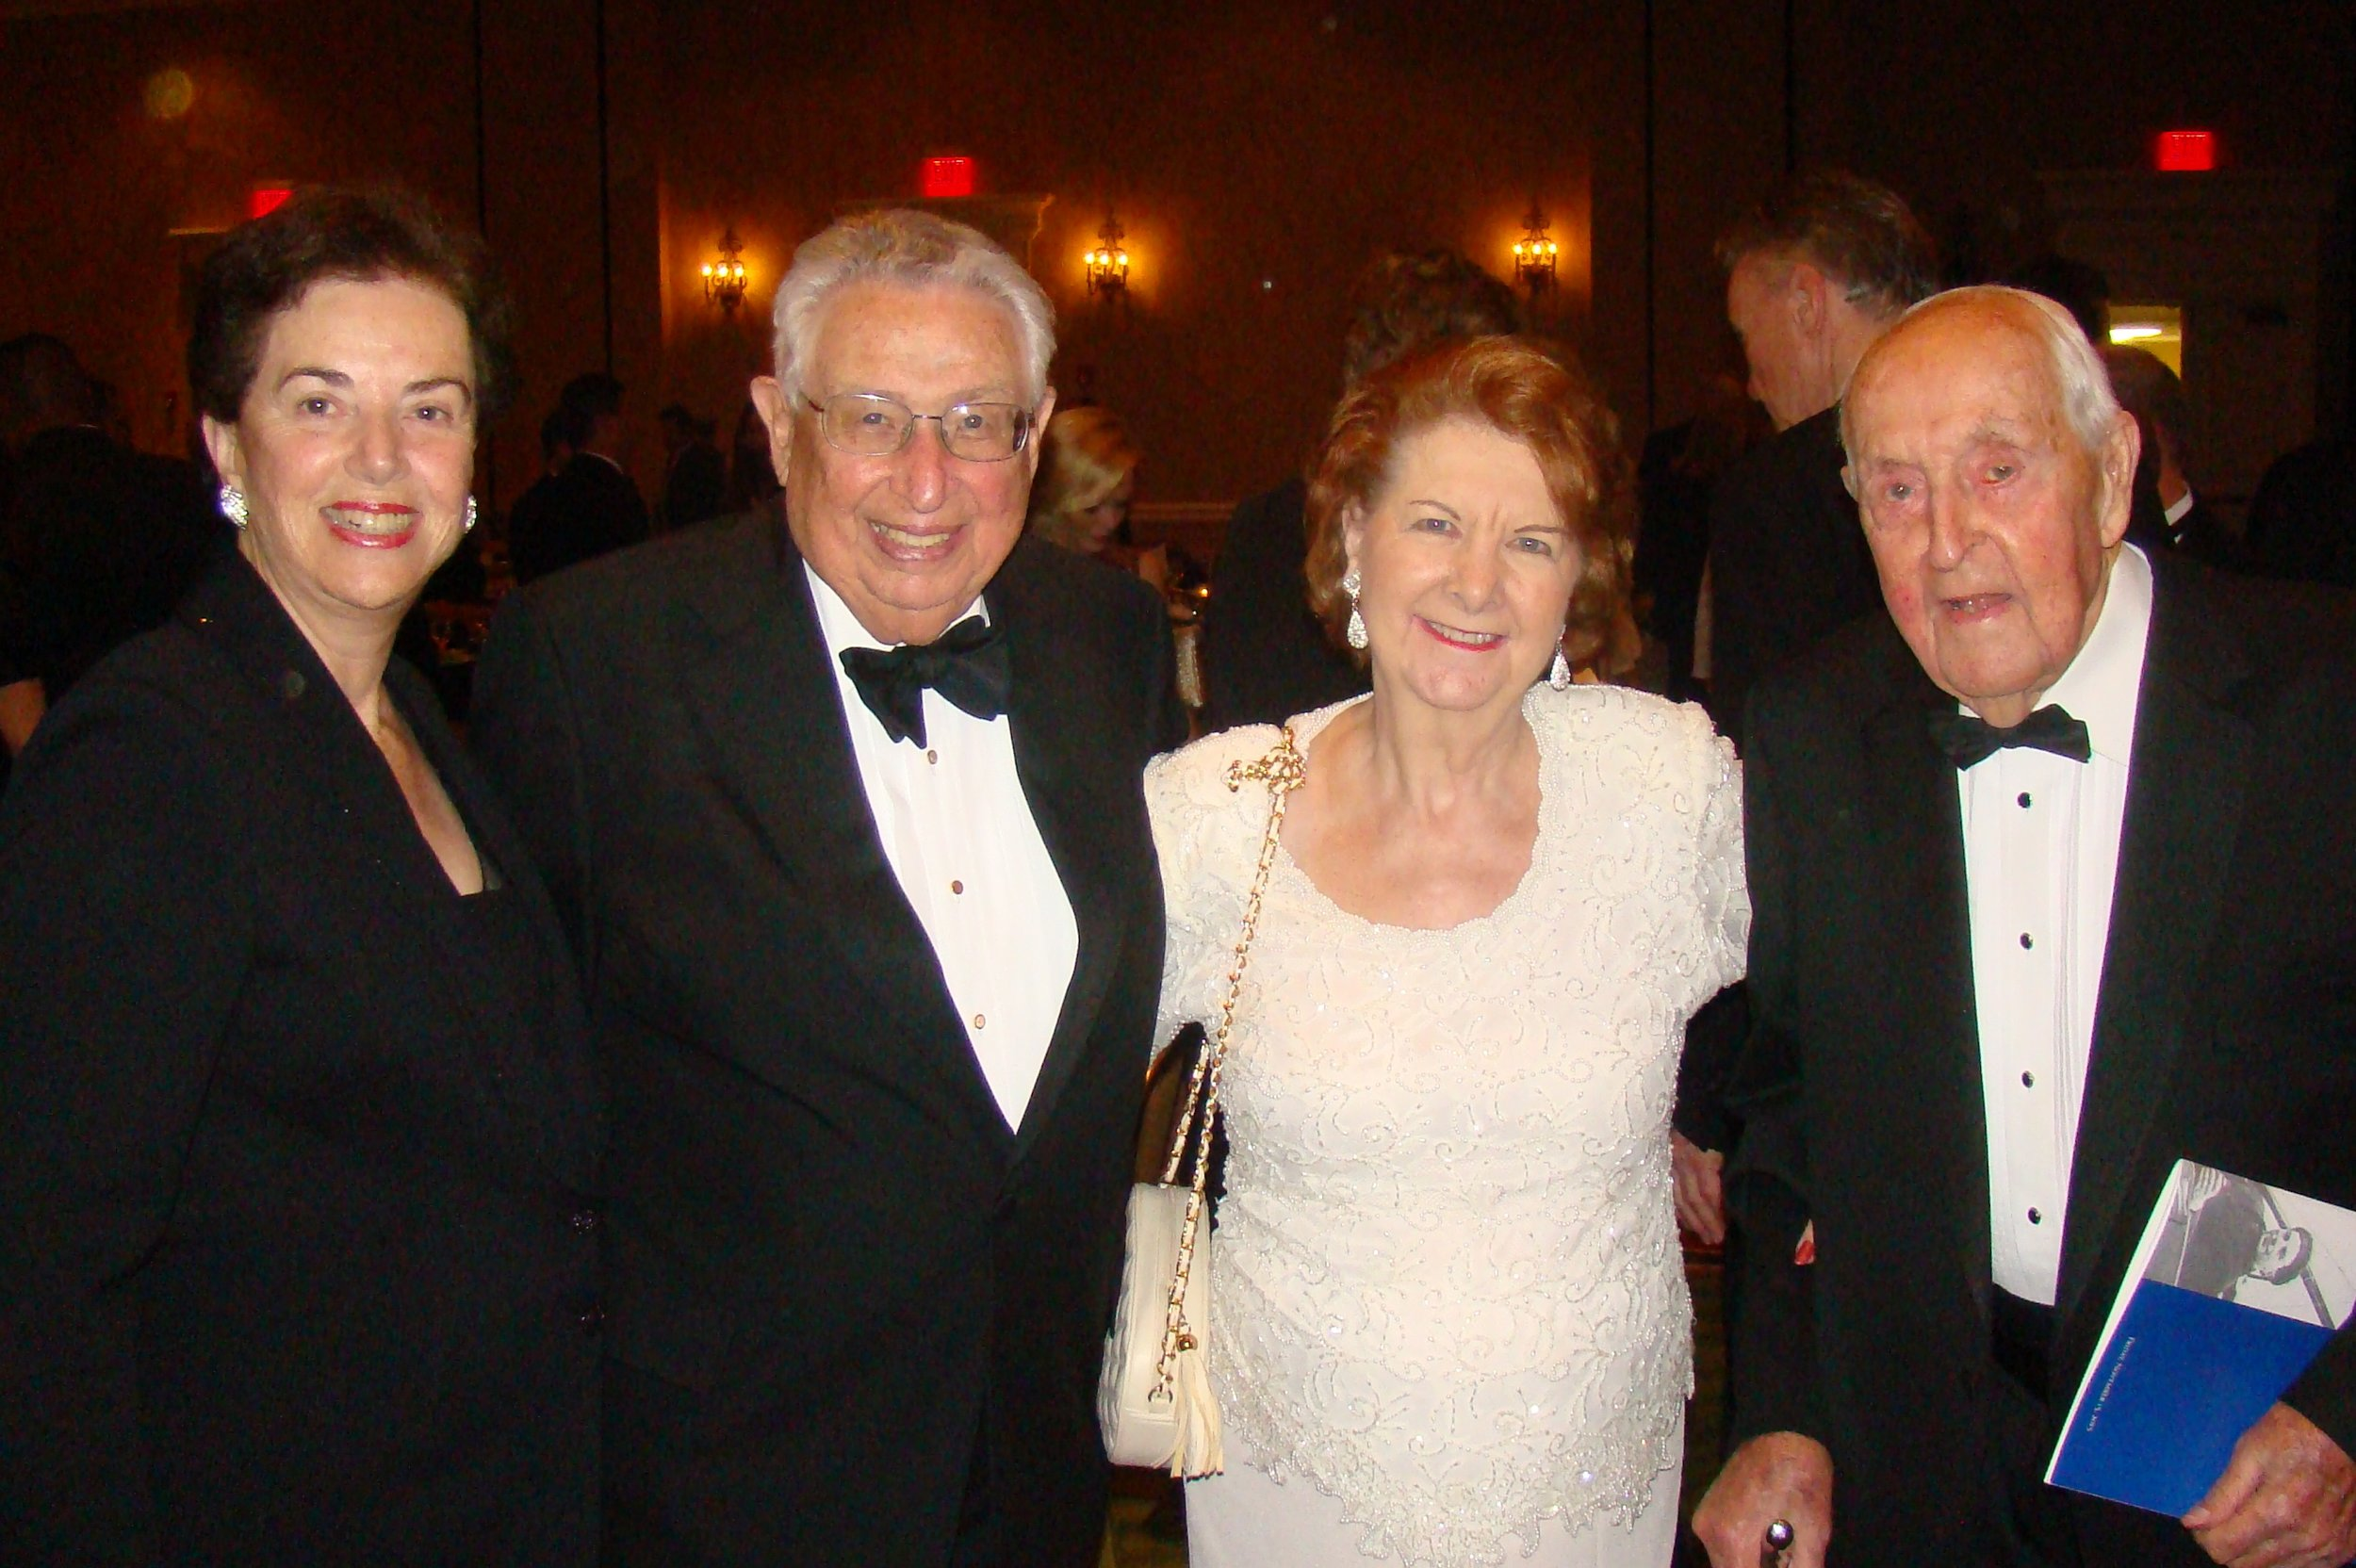 Nancy & Edwin Colodny, Dorothy Derrick and Sir Lenox Hewitt, 15 Nov '13 - Copy (2).JPG